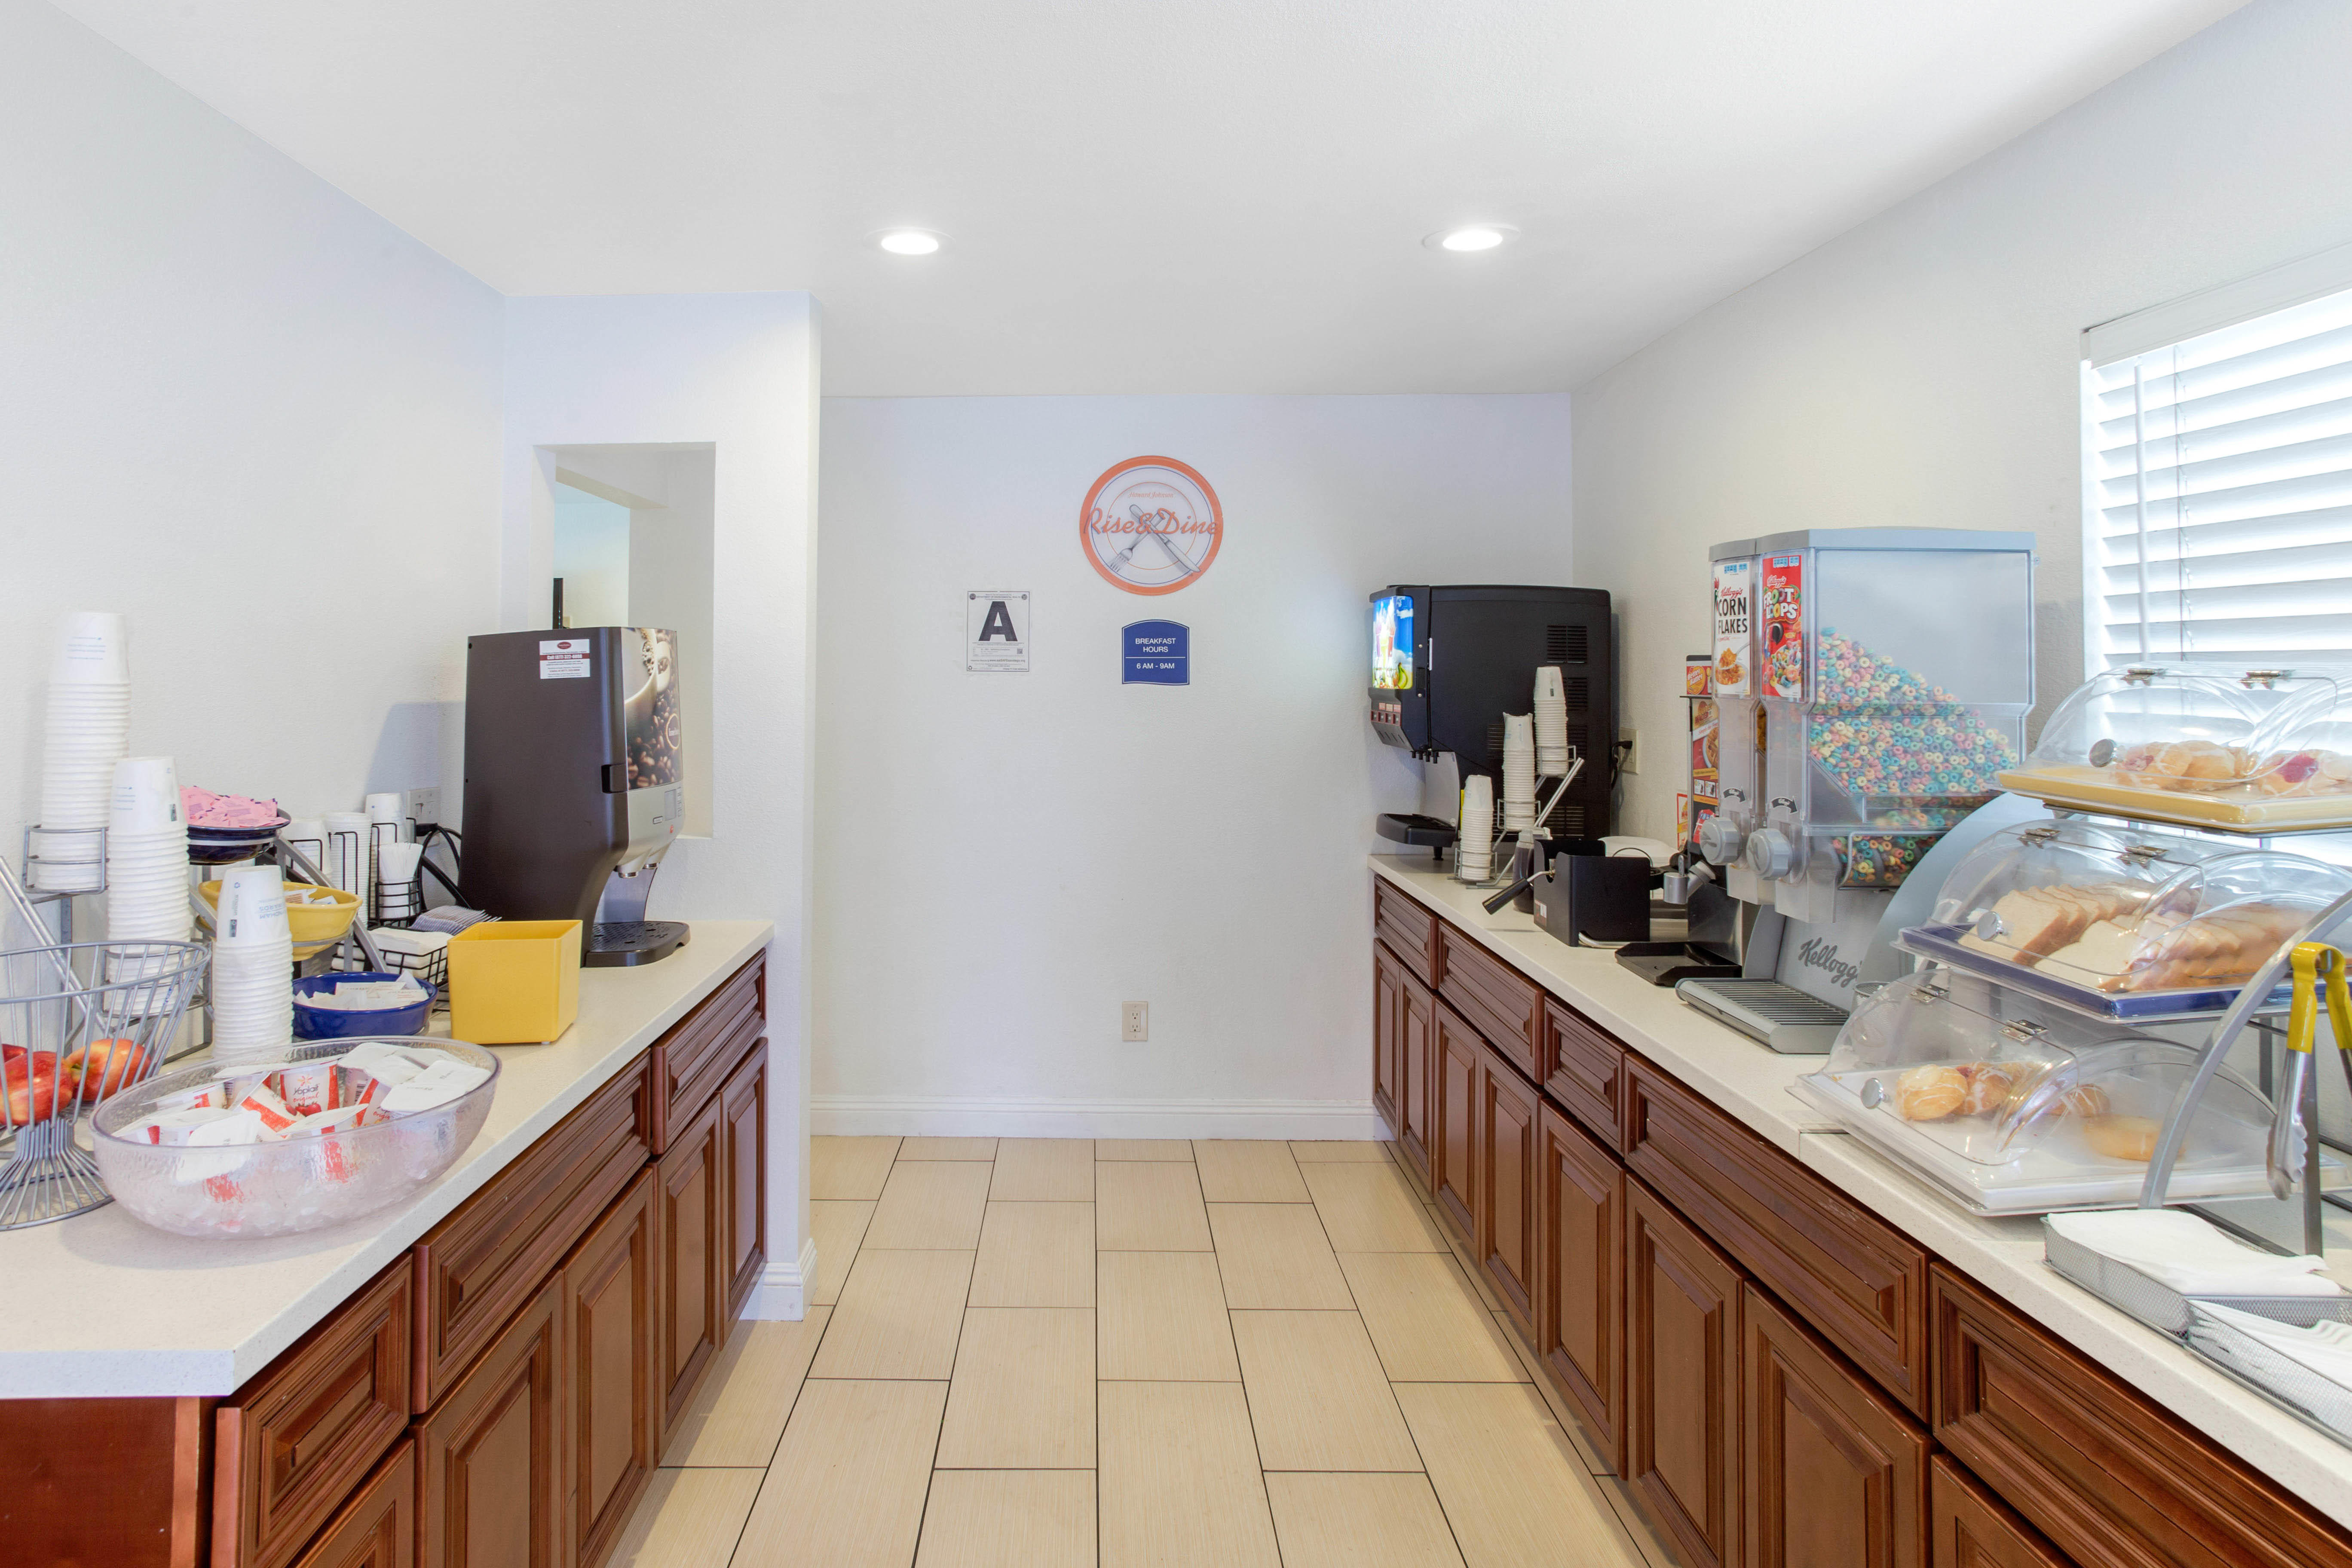 Howard Johnson by Wyndham Chula Vista San Diego Suite Hotel image 16